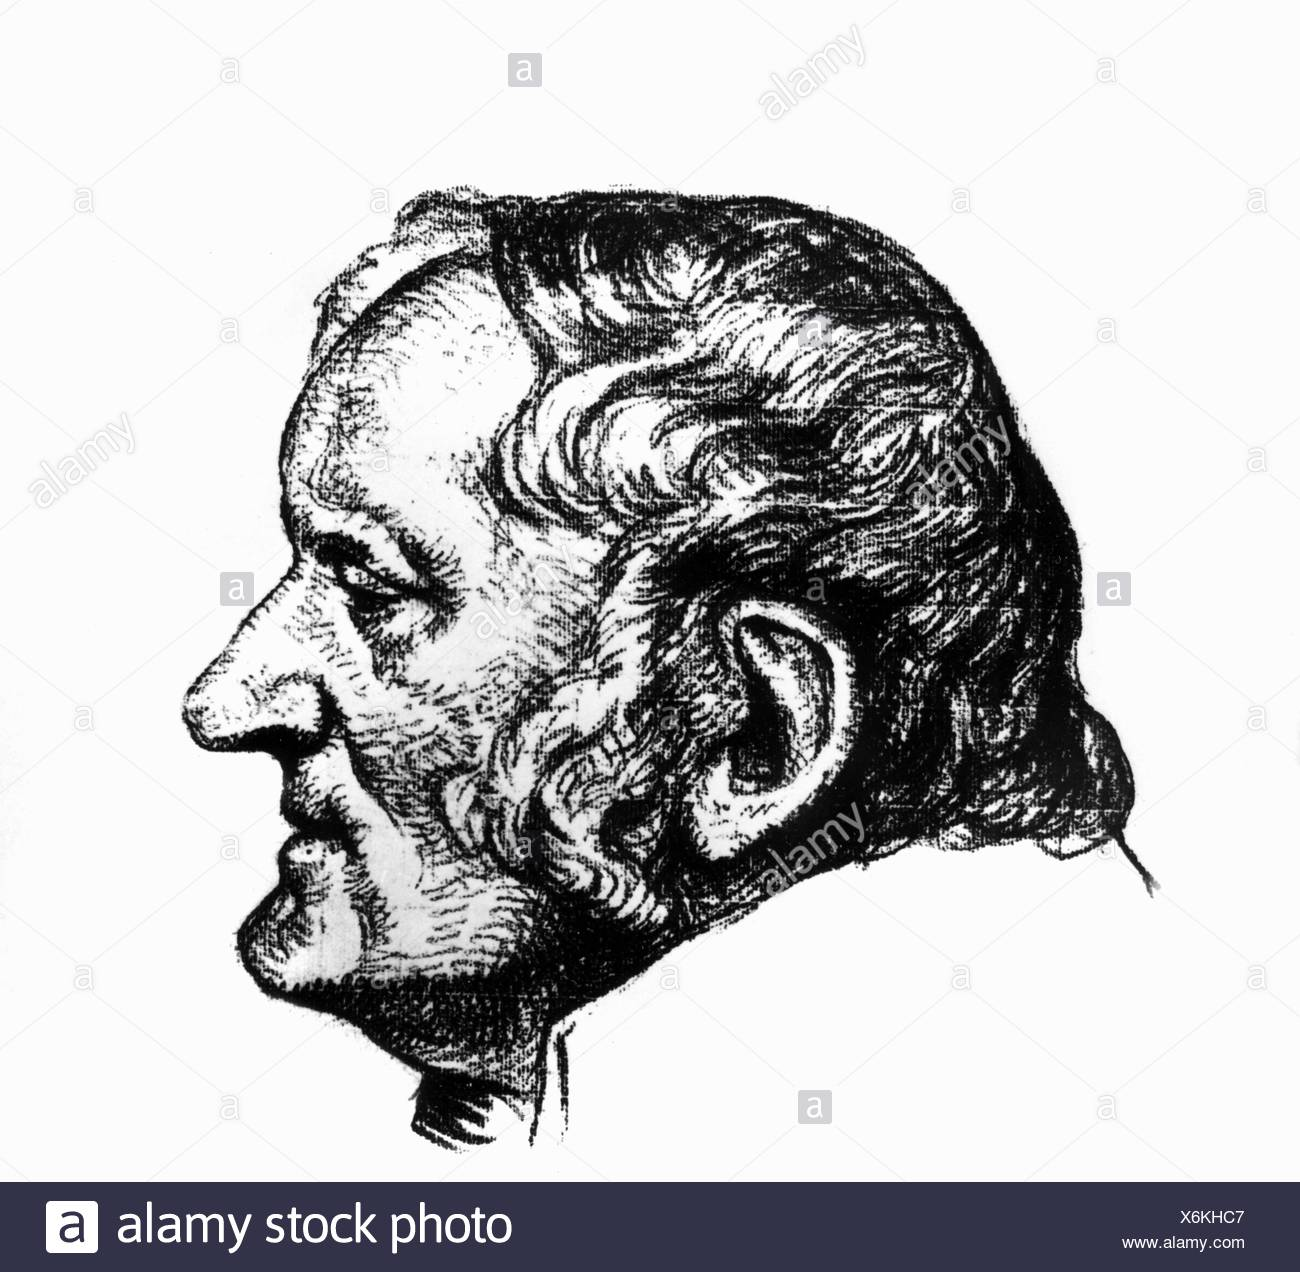 dalton john 6 9 1766 27 7 1844 english physicist chemist